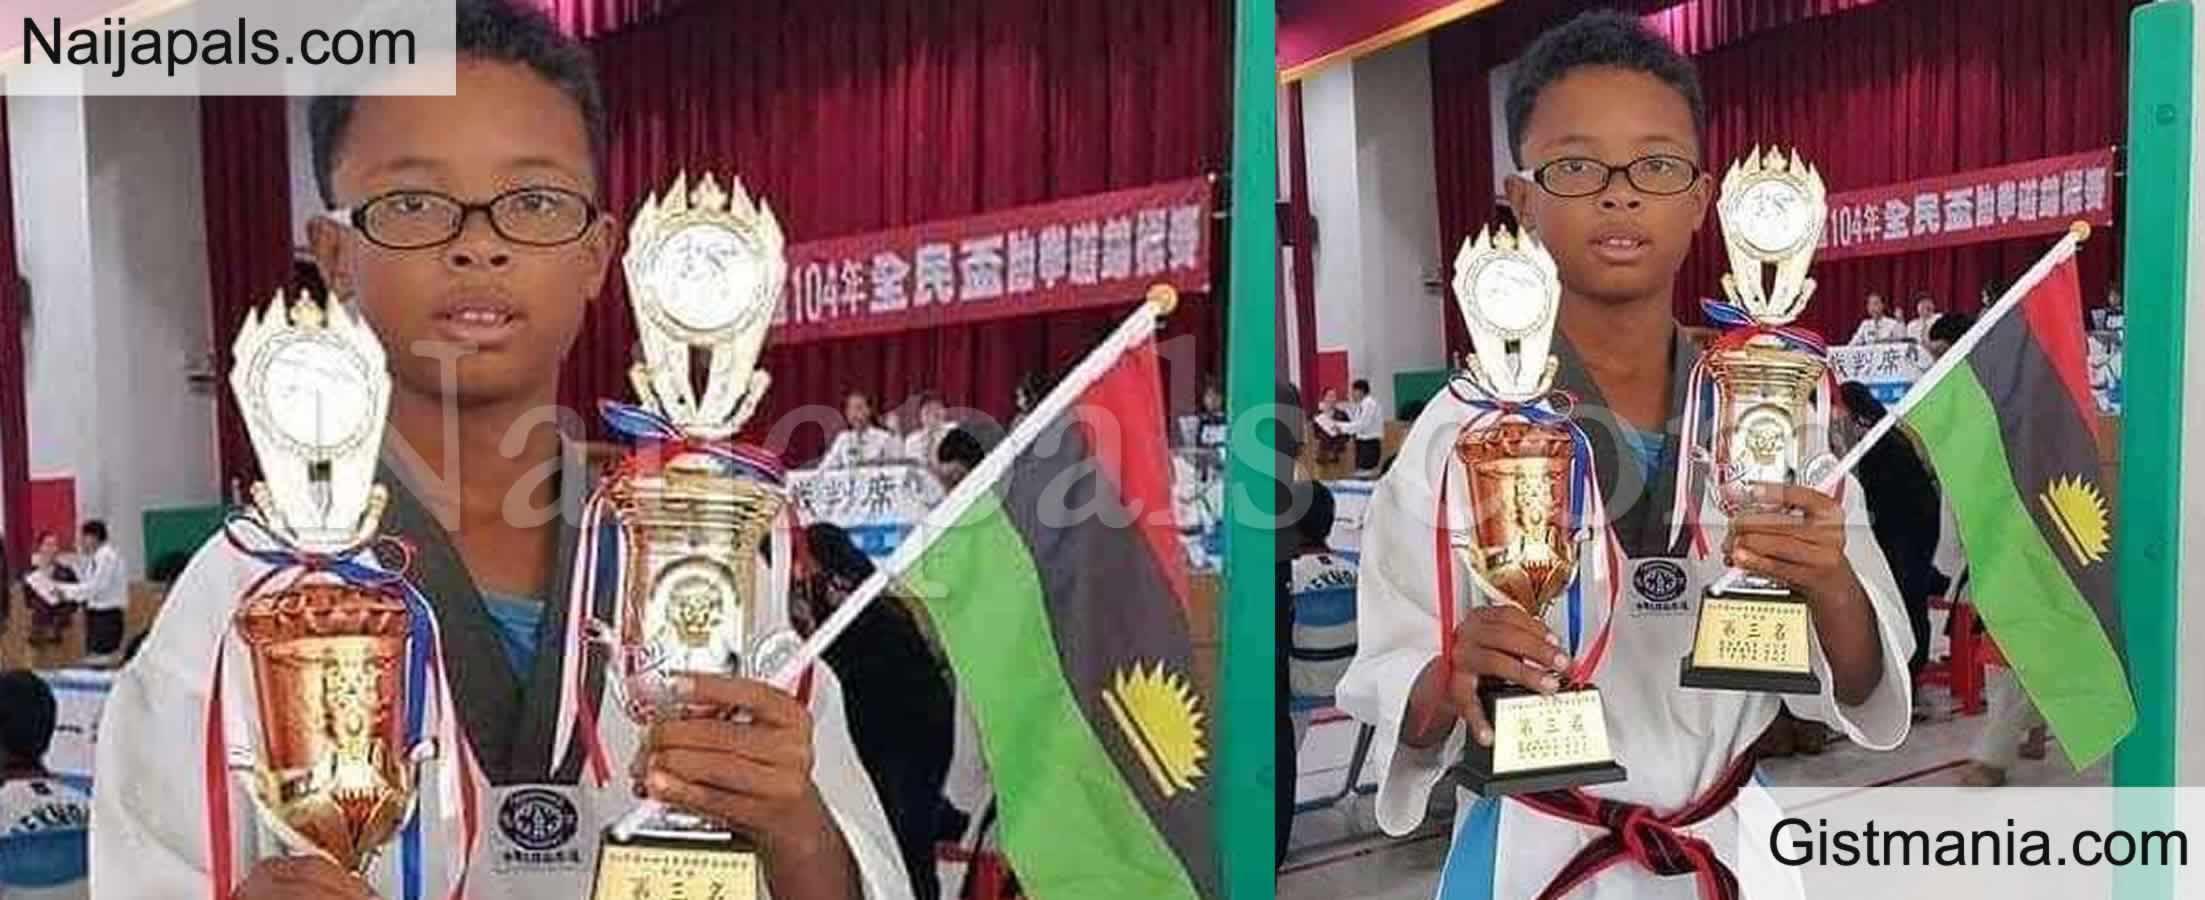 <img alt='.' class='lazyload' data-src='https://img.gistmania.com/emot/comment.gif' /> PHOTOS: <b>Nigerian Boy Celebrates With Biafran Flag As He Emerges Taekwondo Champion In China</b>